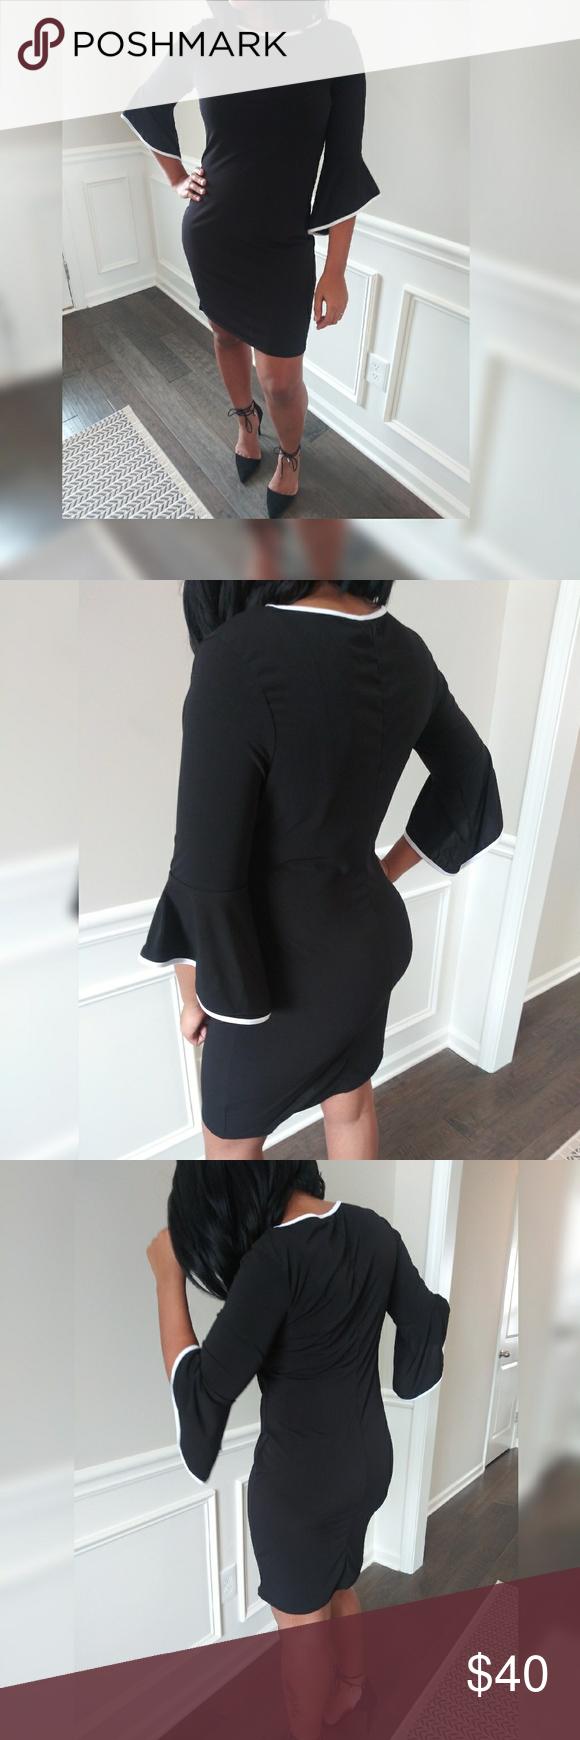 Sage Vicky Dress Clothes Design Dresses Fashion [ 1740 x 580 Pixel ]